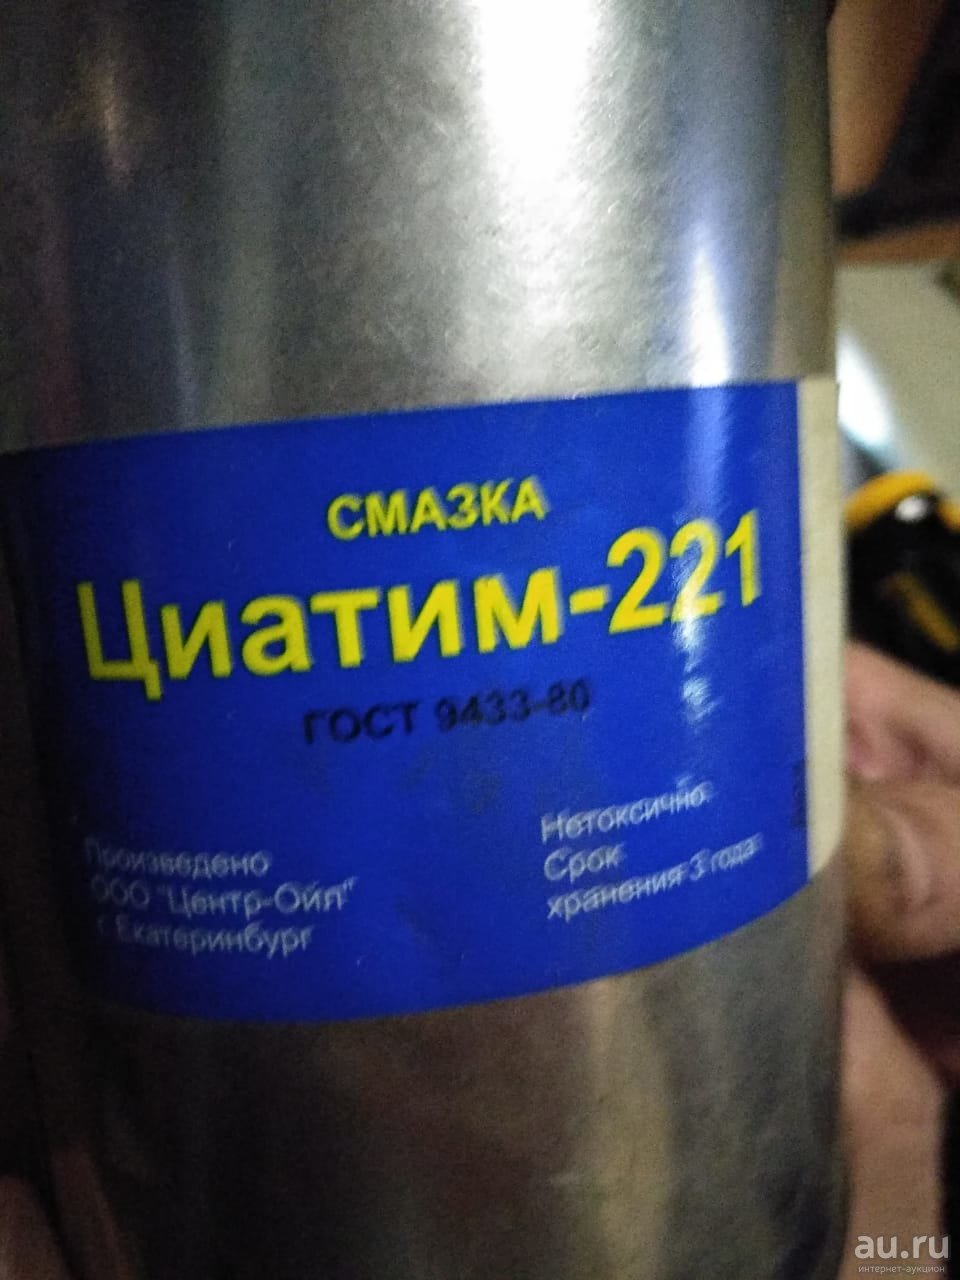 Смазка циатим 221